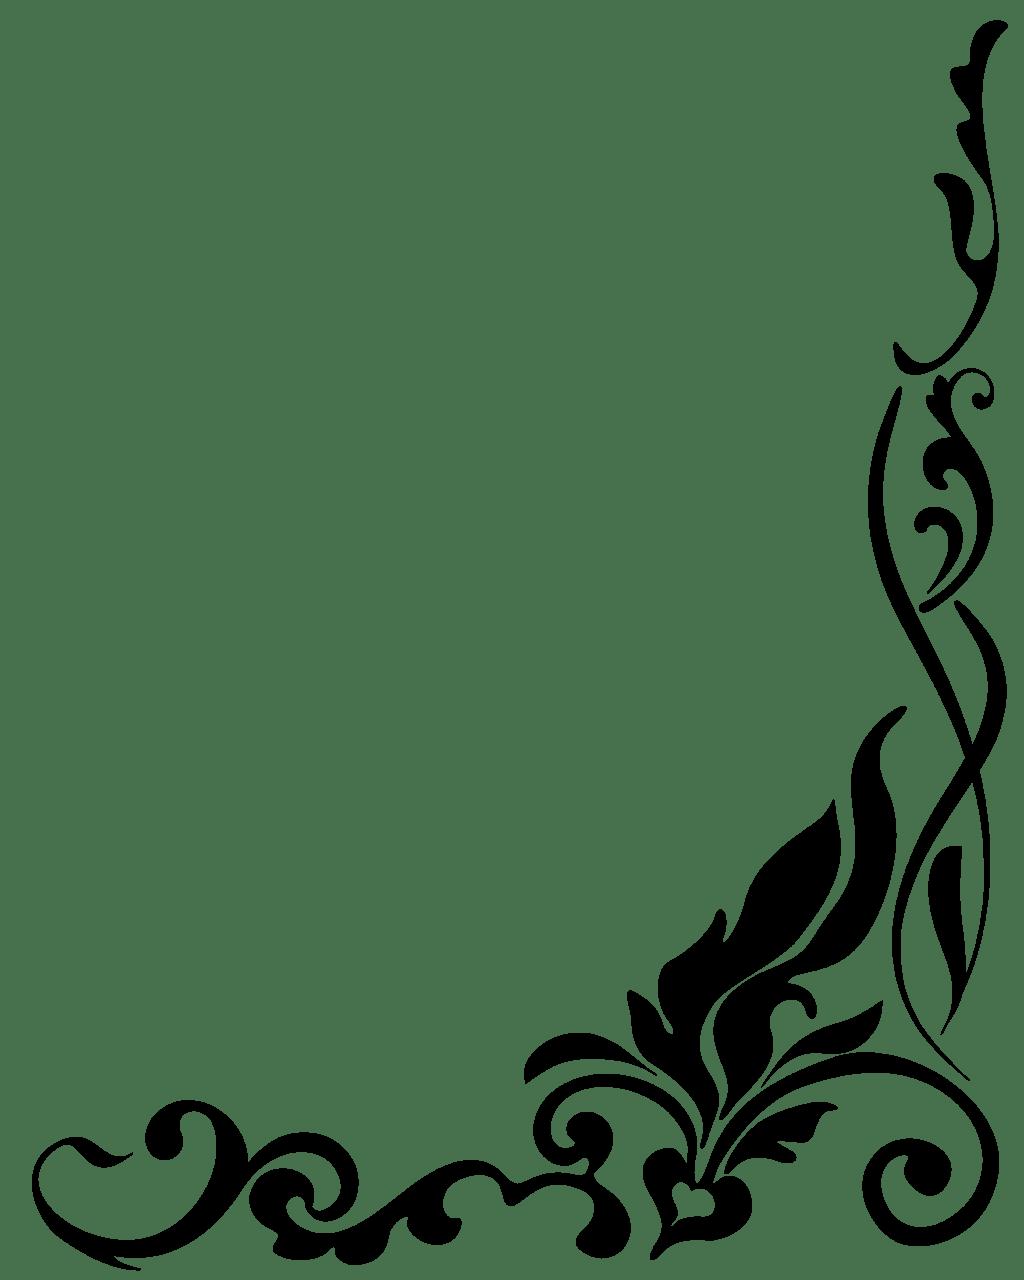 Free Border Download Free Clip Art Free Clip Art On